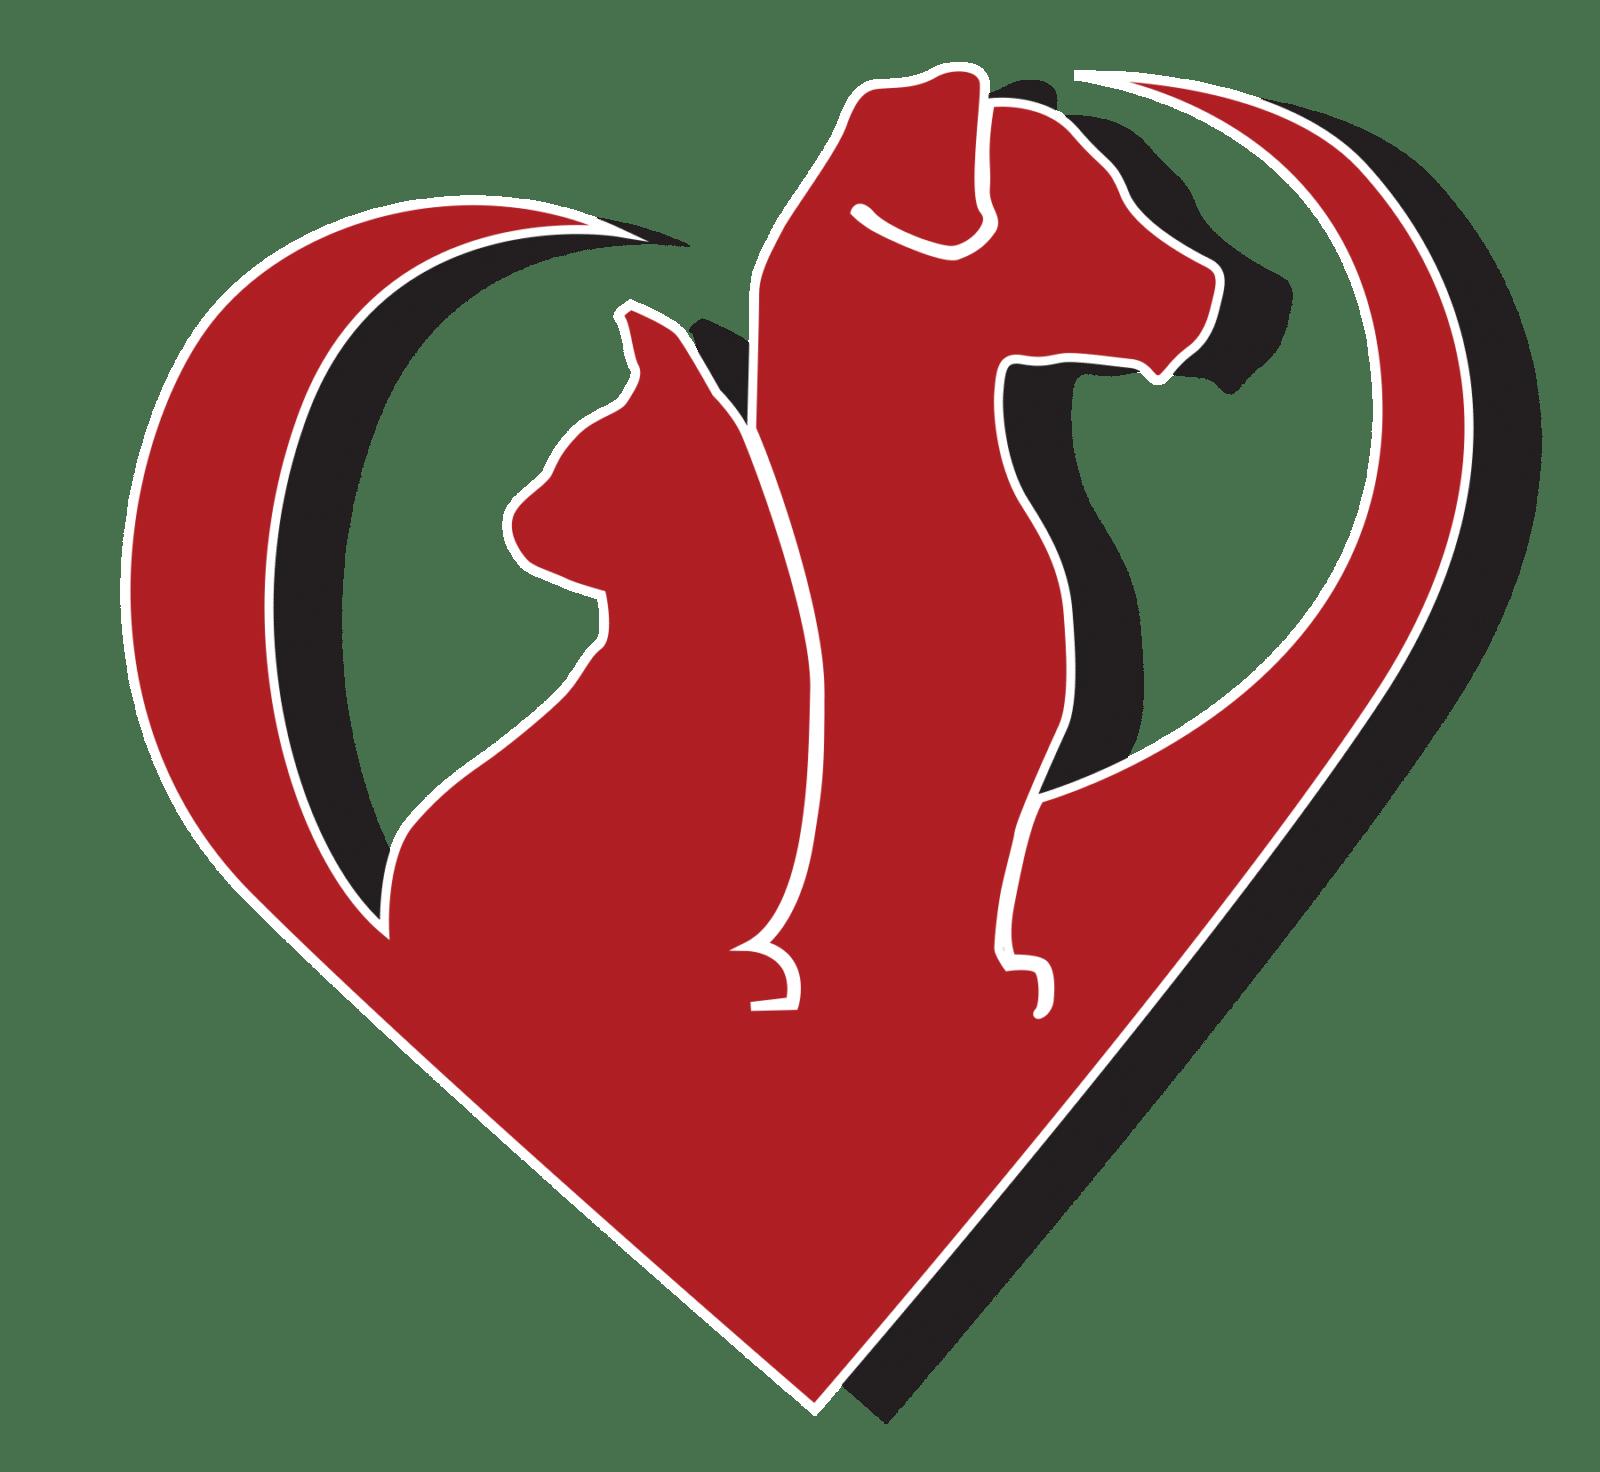 Orion Animal Hospital